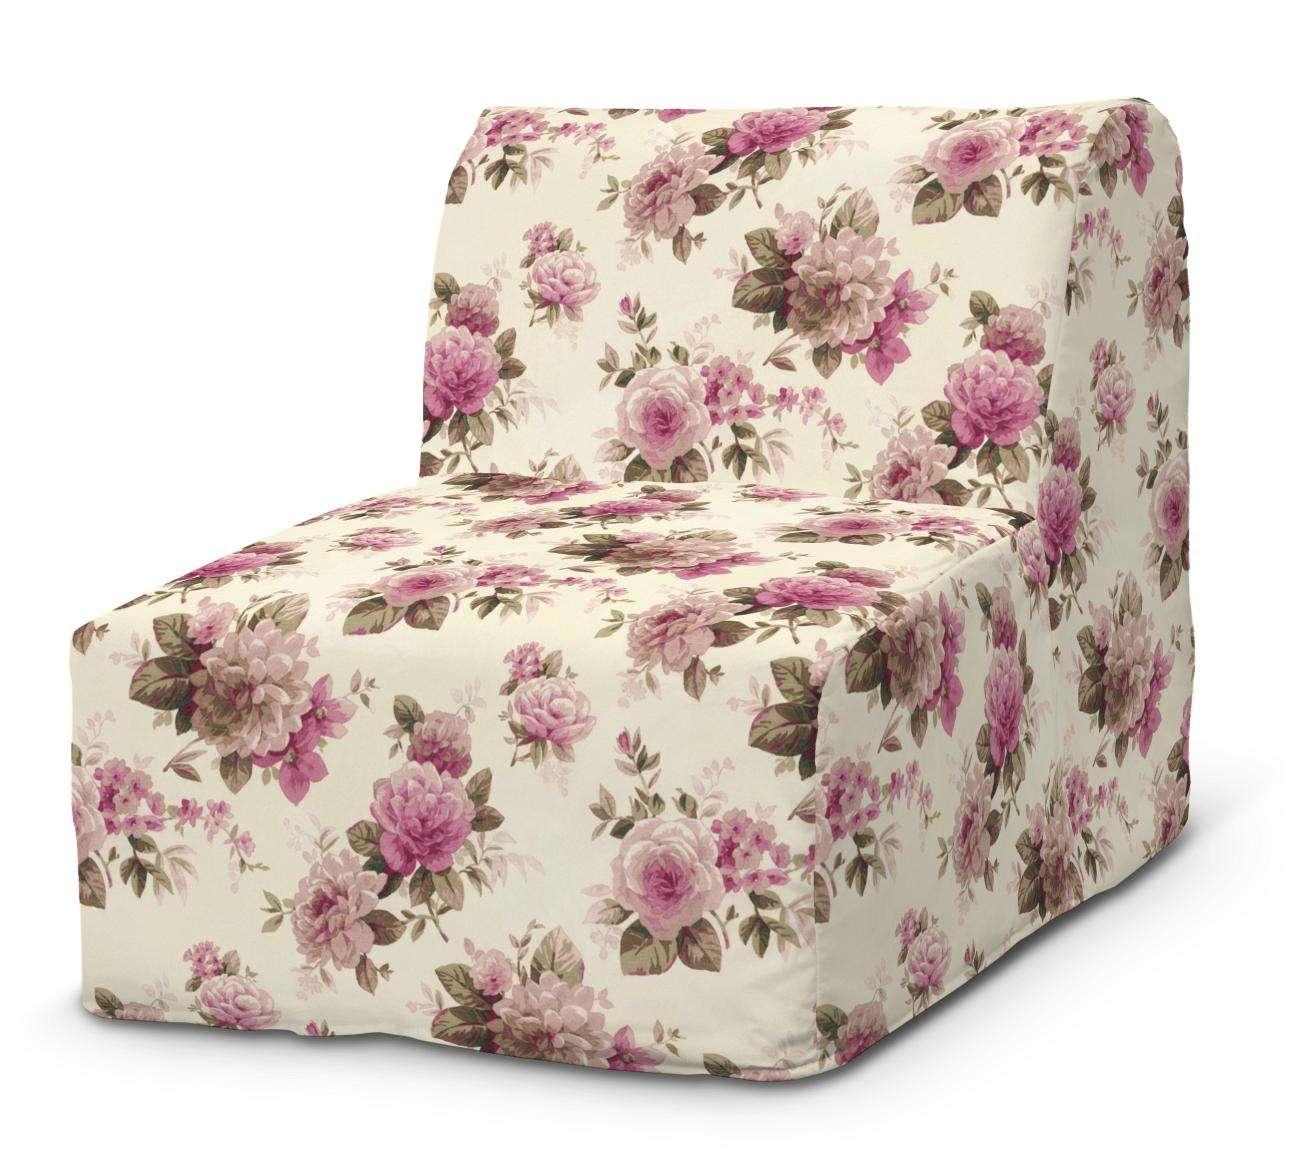 Lycksele Sesselbezug von der Kollektion Londres, Stoff: 141-07